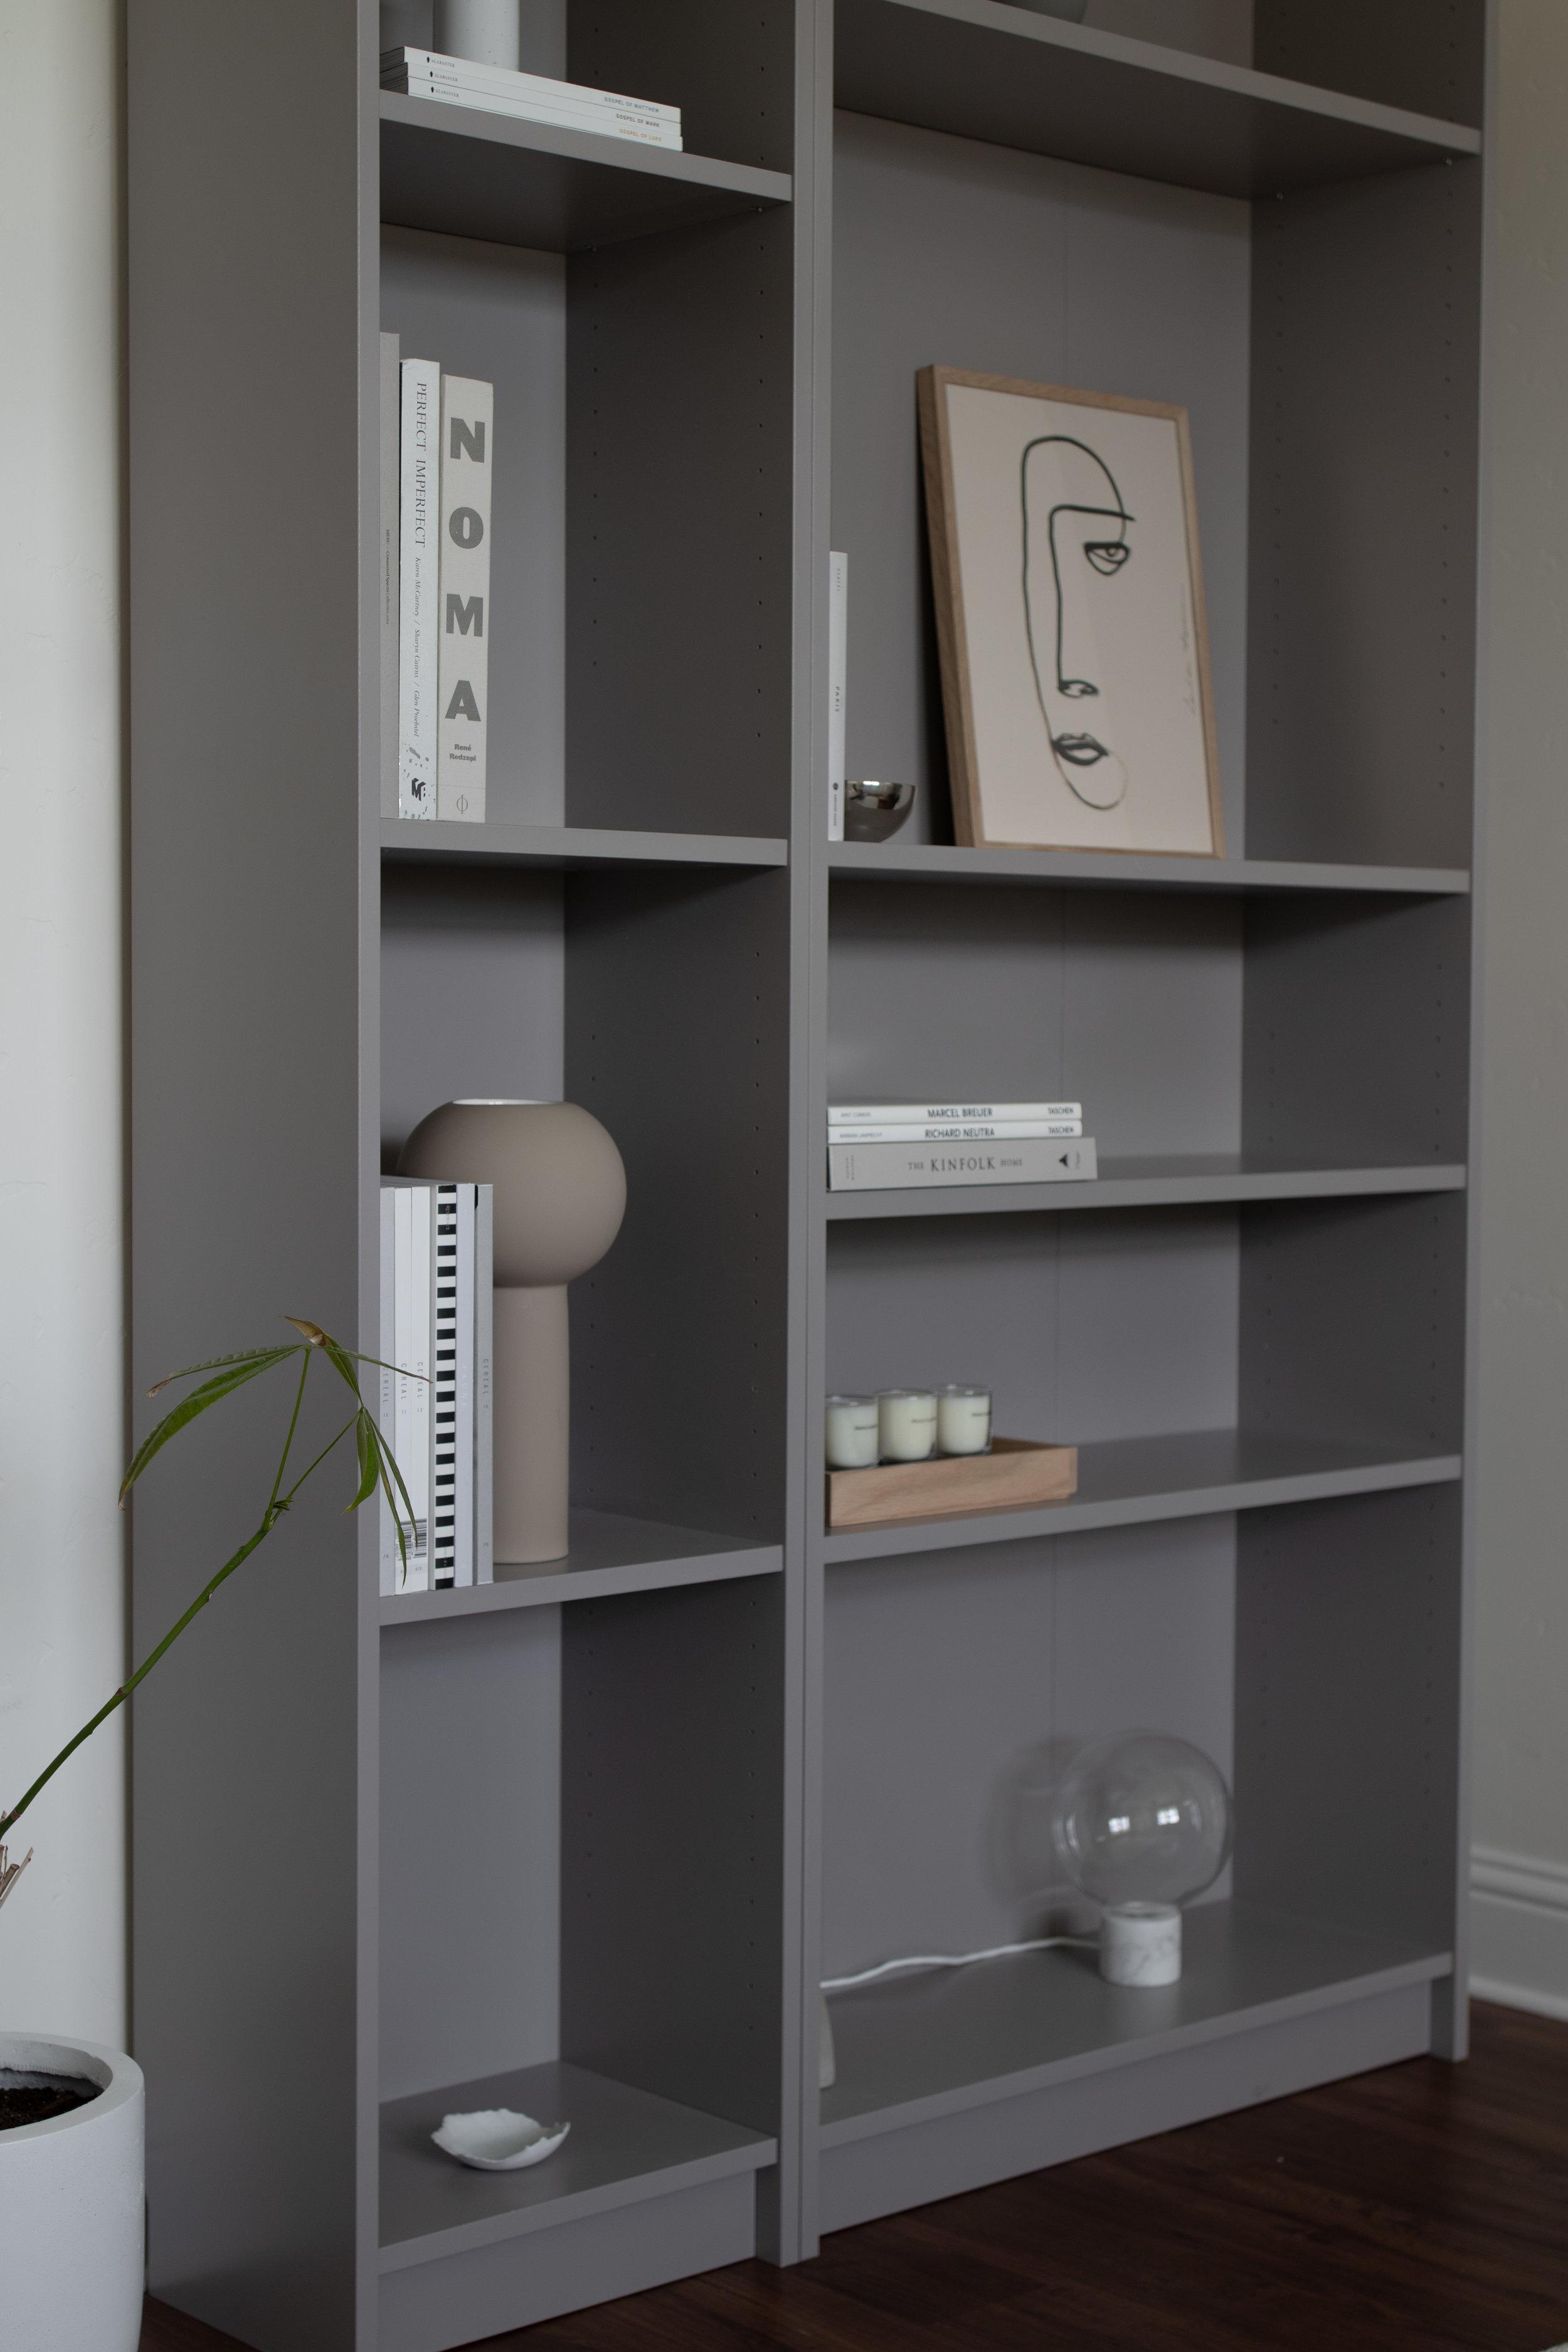 Minimalist Bookshelves in living space